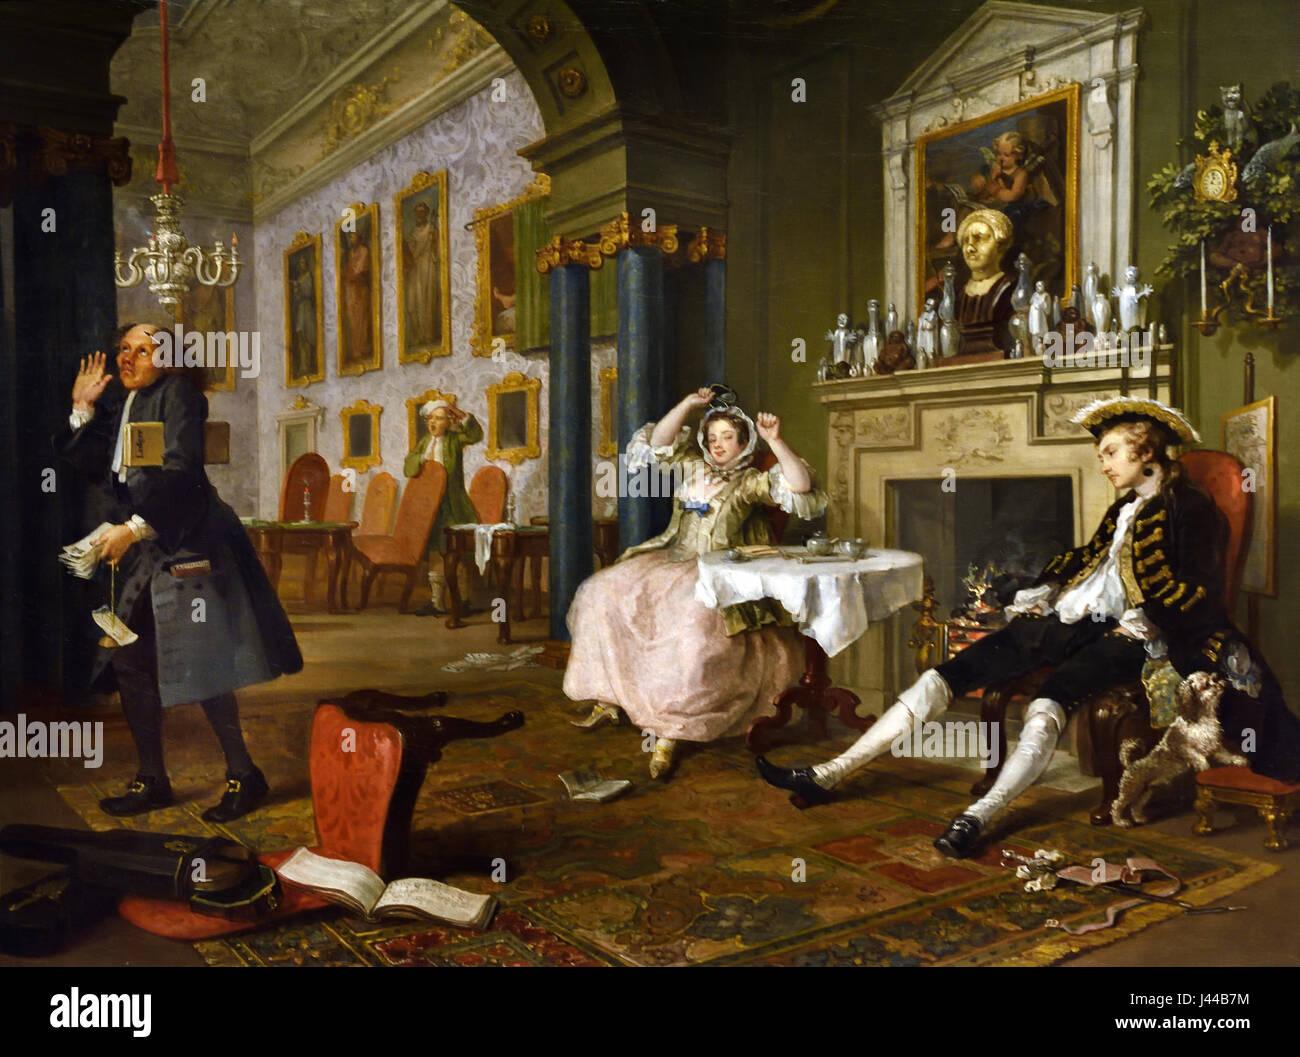 Marriage A-la-Mode: 2, The Tête à Tête 1743, William Hogarth 1697 - 1764 United Kingdom, England, - Stock Image